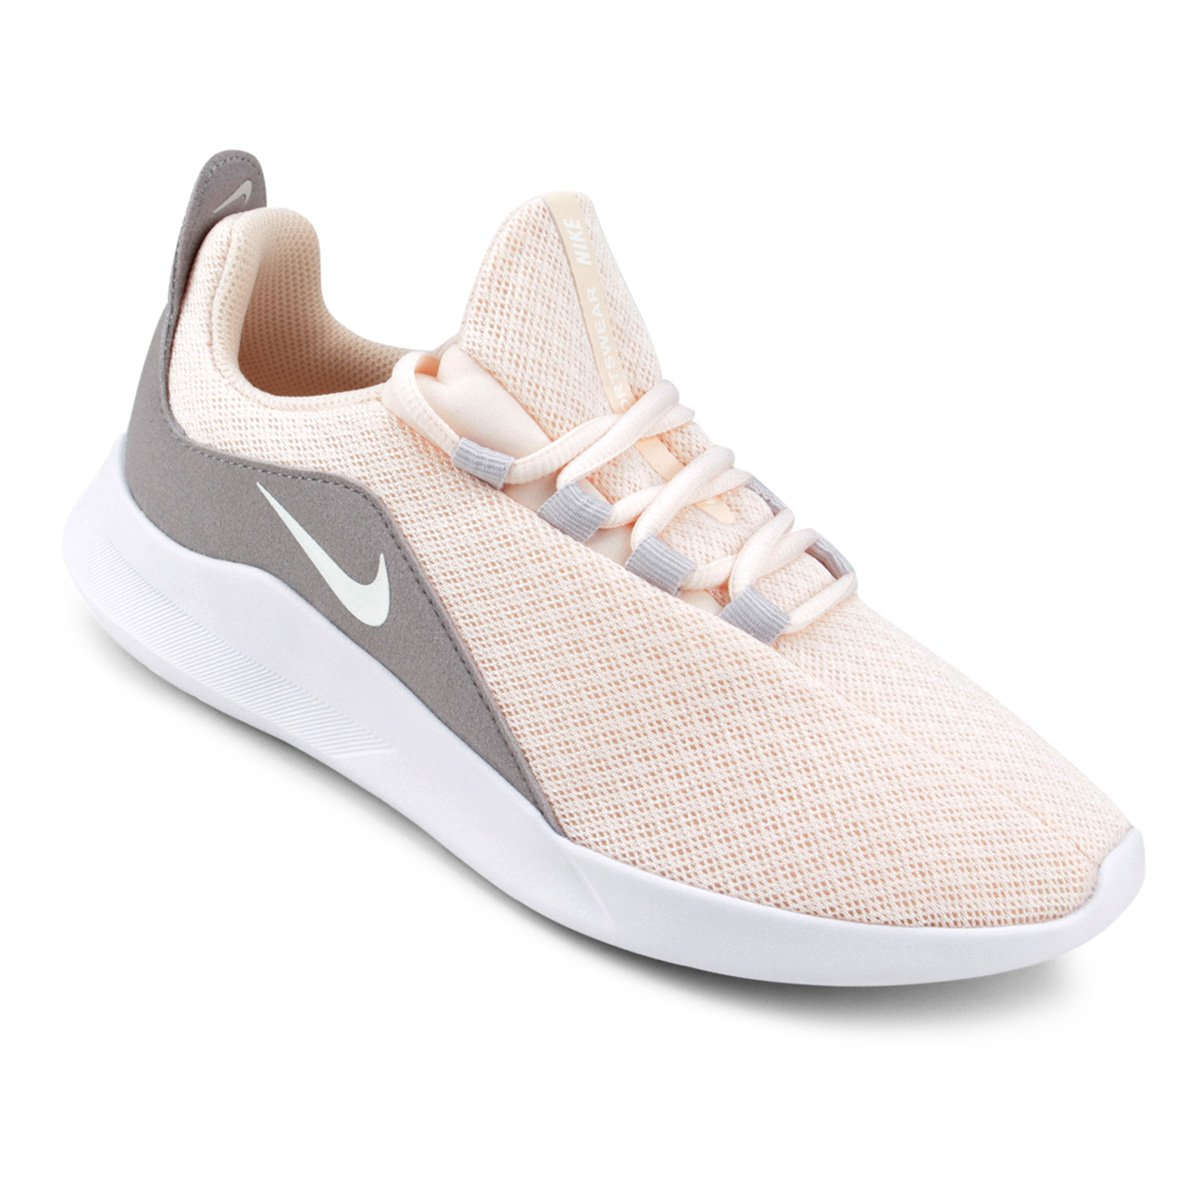 Nike Bege e Nike Tênis e Cinza Feminino Viale Tênis Viale Feminino Cinza Rwnp7AxqT